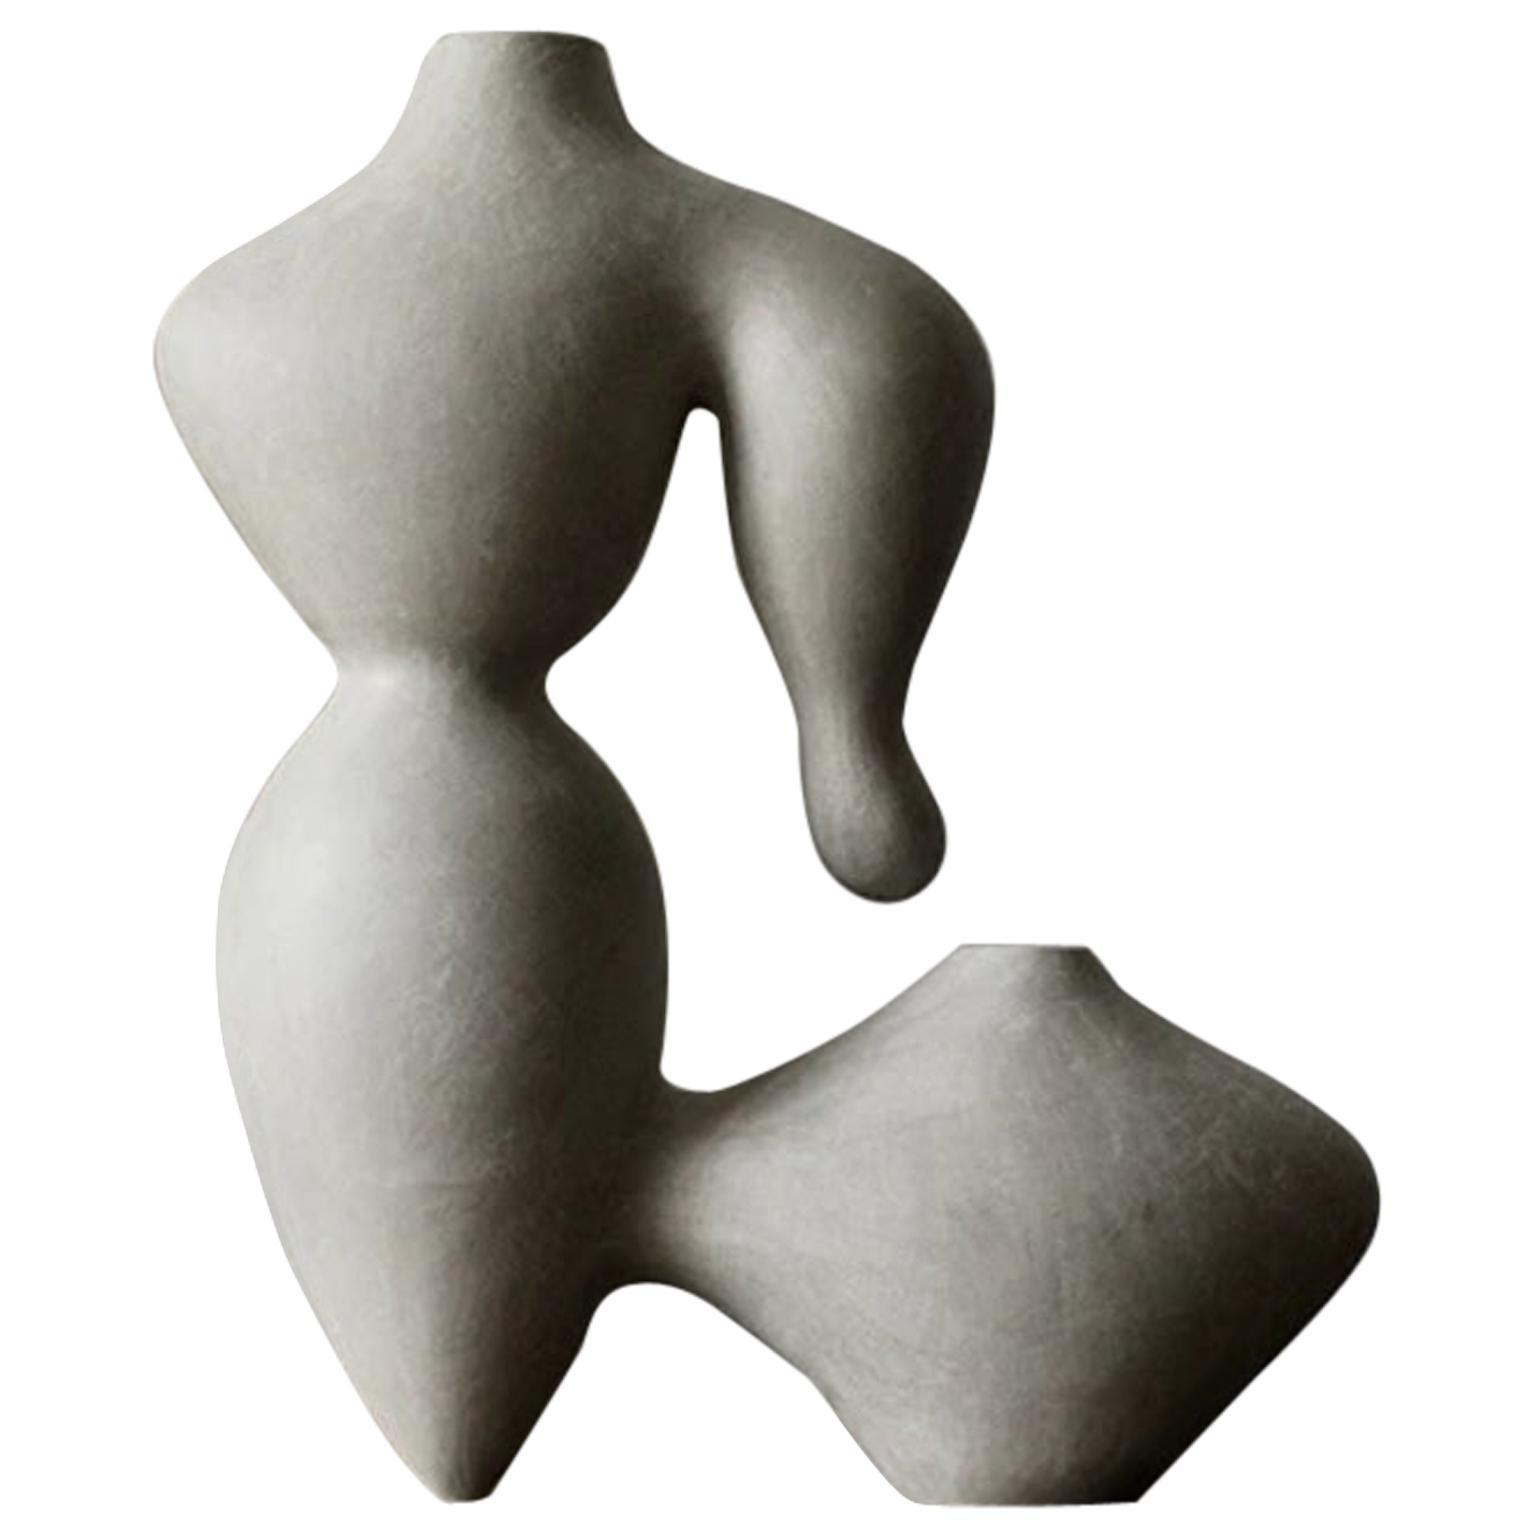 Thesium Vase by Cosmin Florea